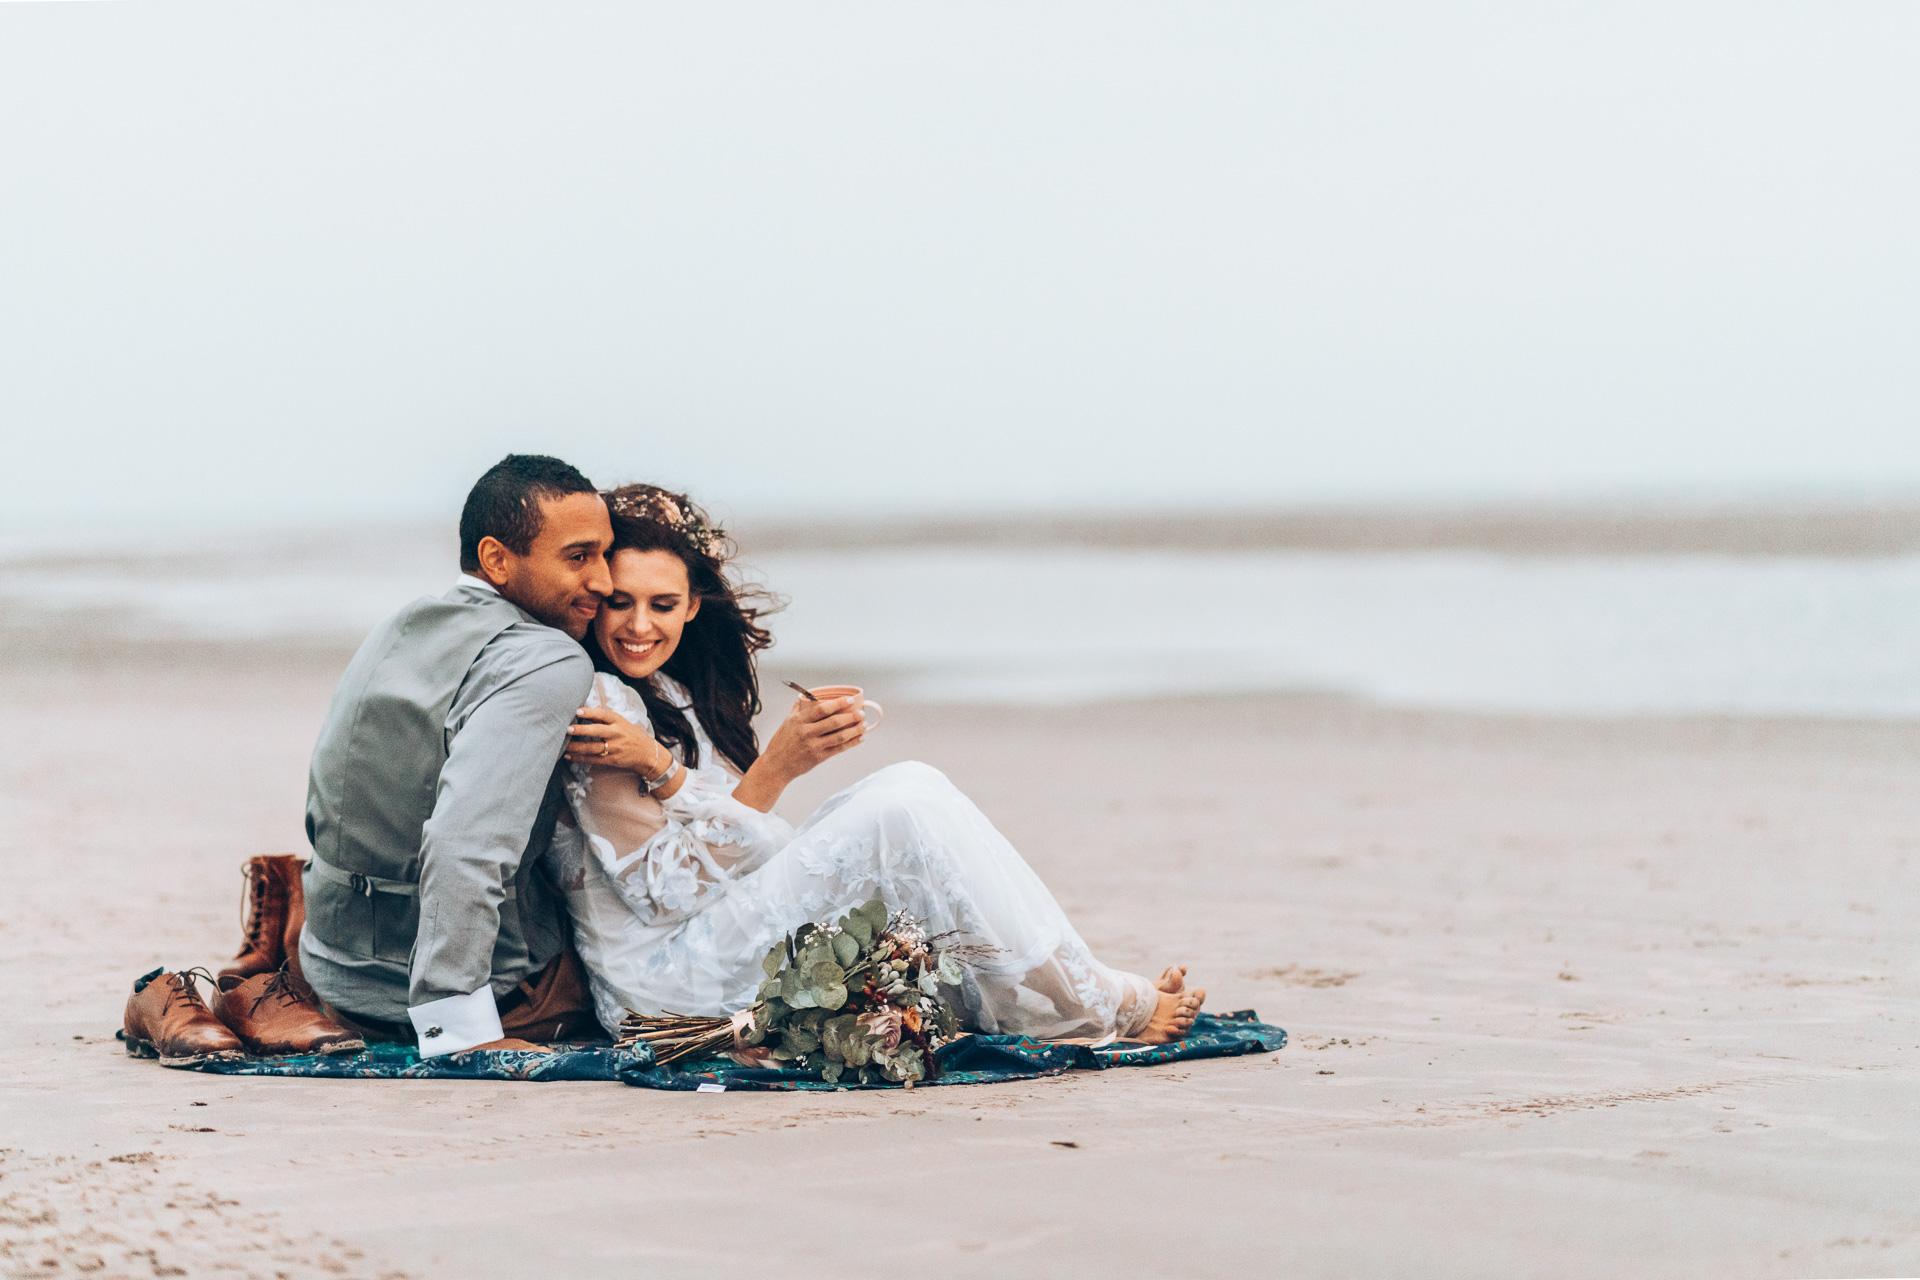 Small intimate weddings 519